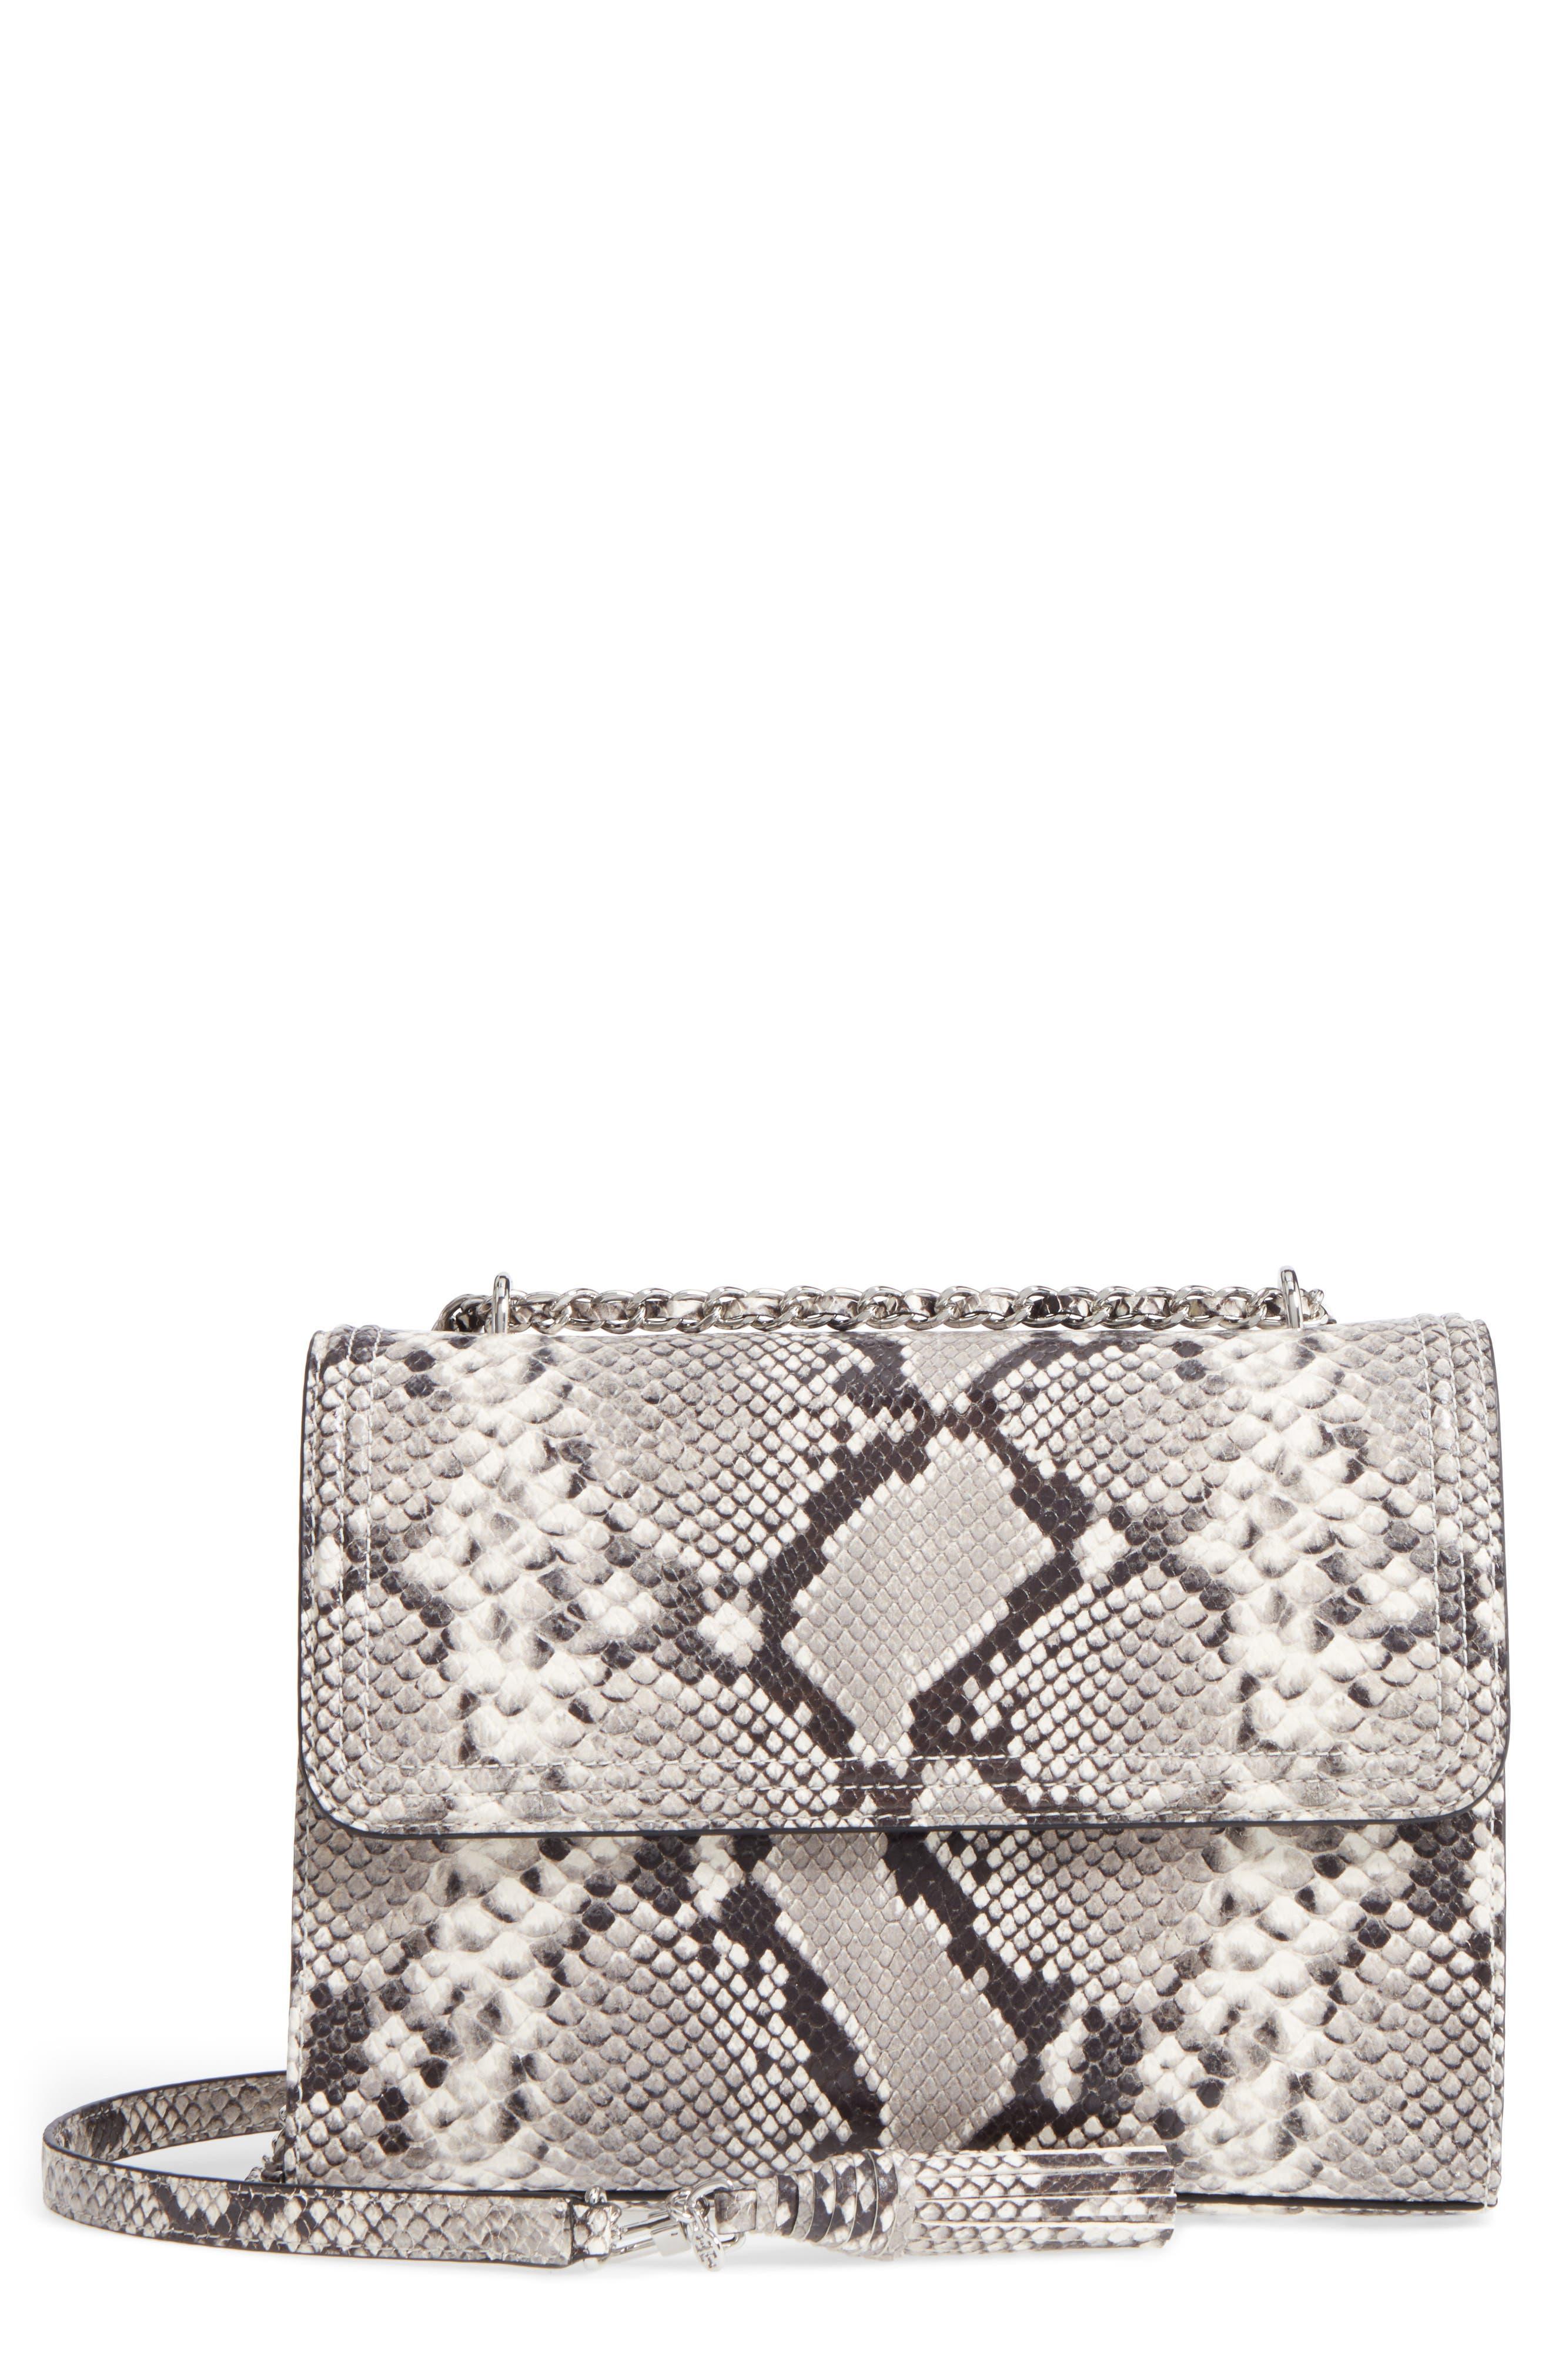 Fleming Convertible Leather Shoulder Bag,                             Main thumbnail 1, color,                             001